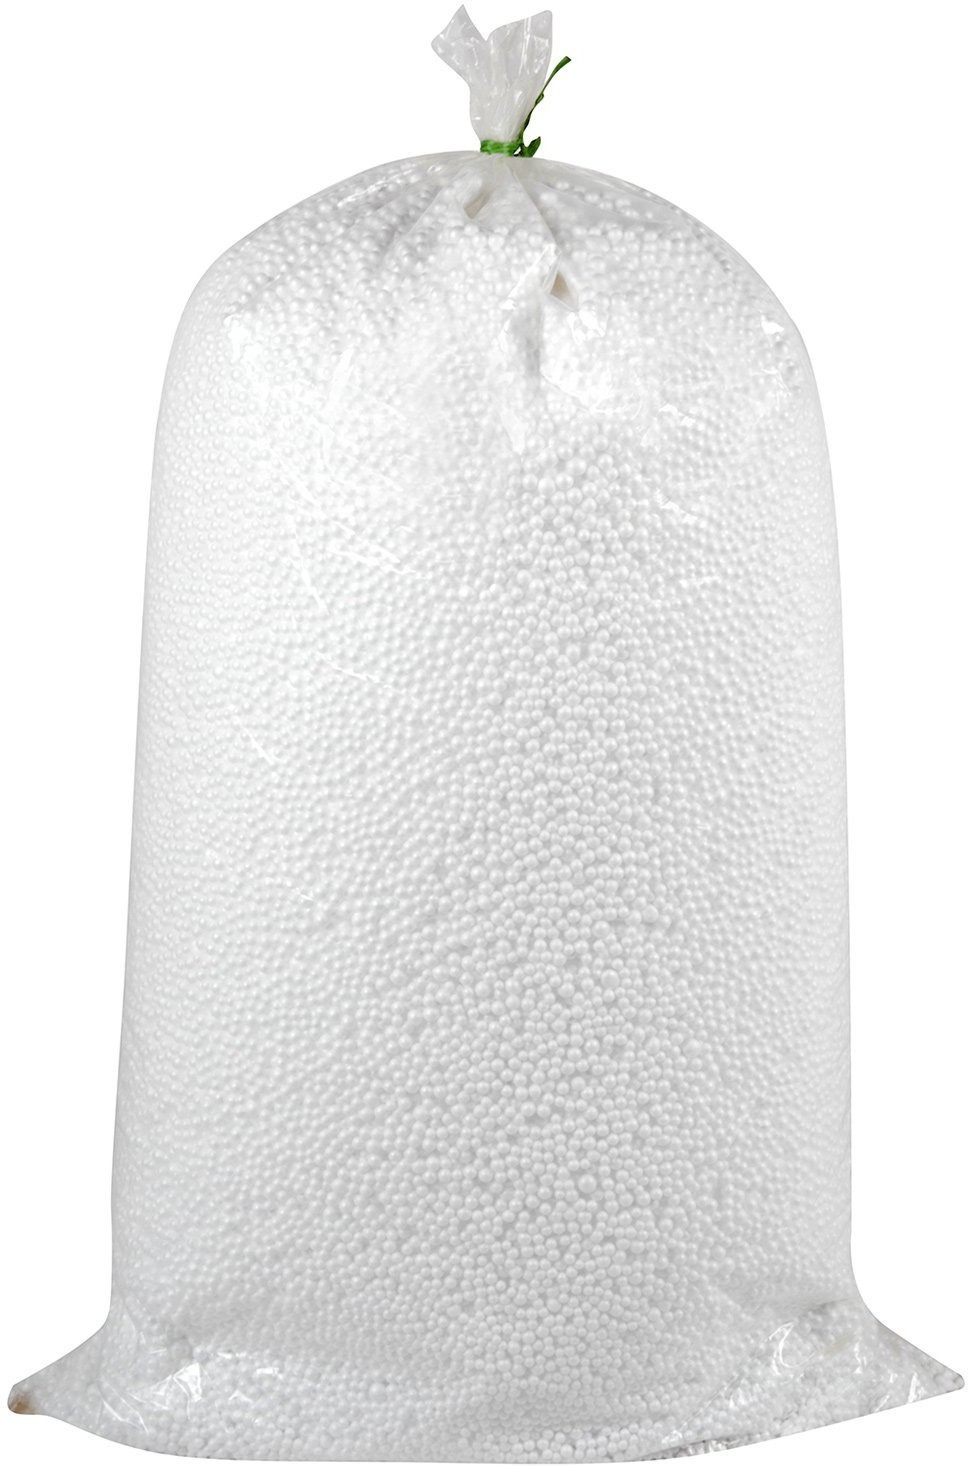 View Thermoplast Bean Bag Filler(Virgin) Furniture (Thermoplast)